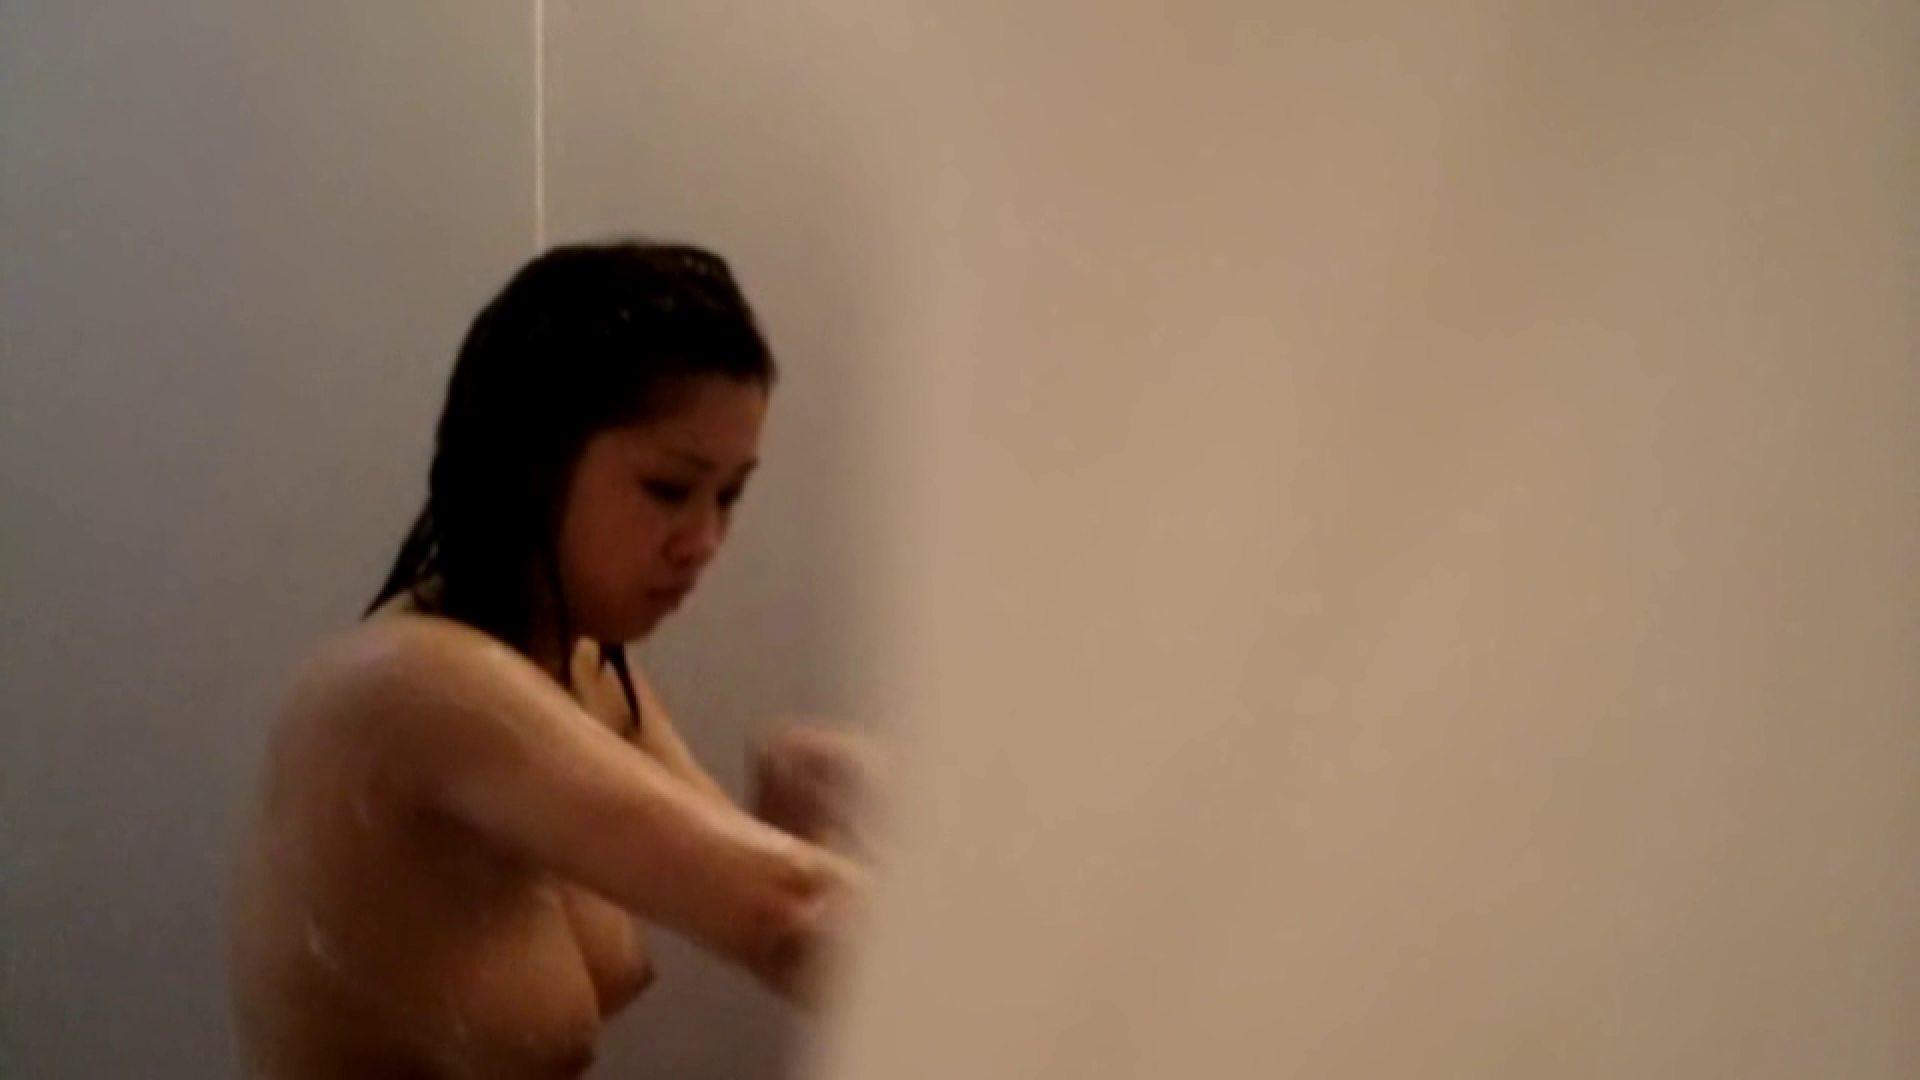 vol.2 葵のグラドル顔負けの爆乳を入浴シーンでどうぞ。 巨乳 ぱこり動画紹介 110枚 93